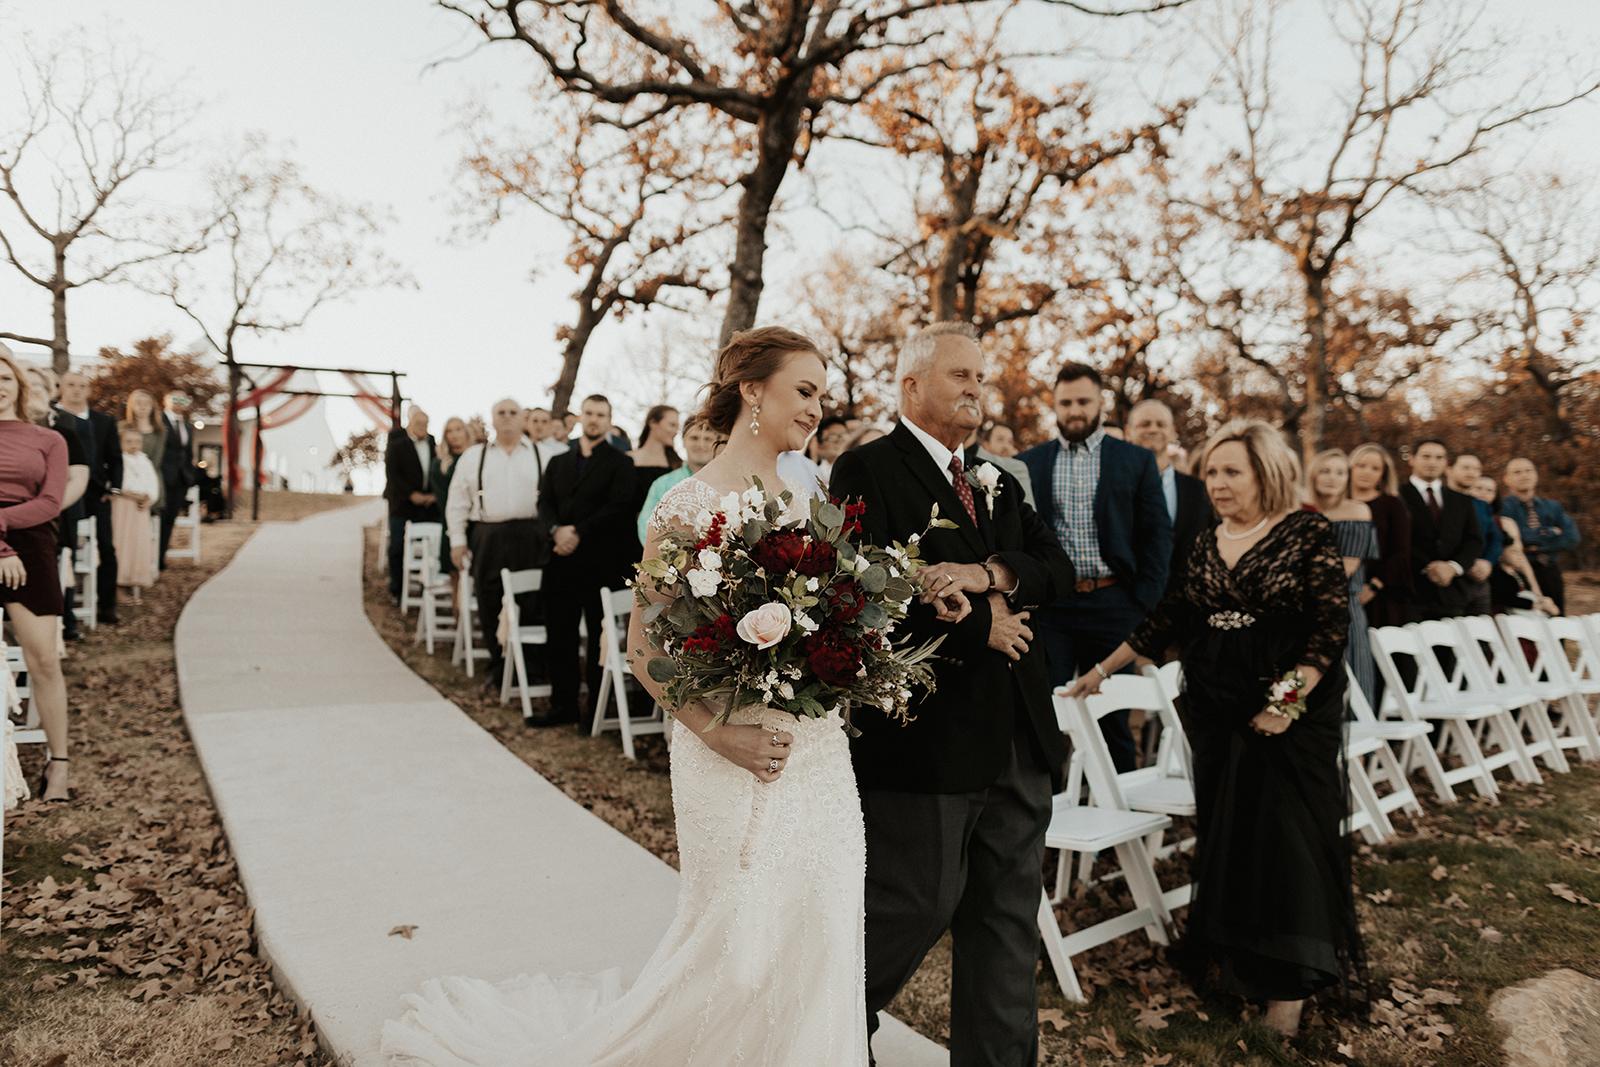 Best Wedding Venue in Tulsa Bixby Dream Point Ranch 47.jpg